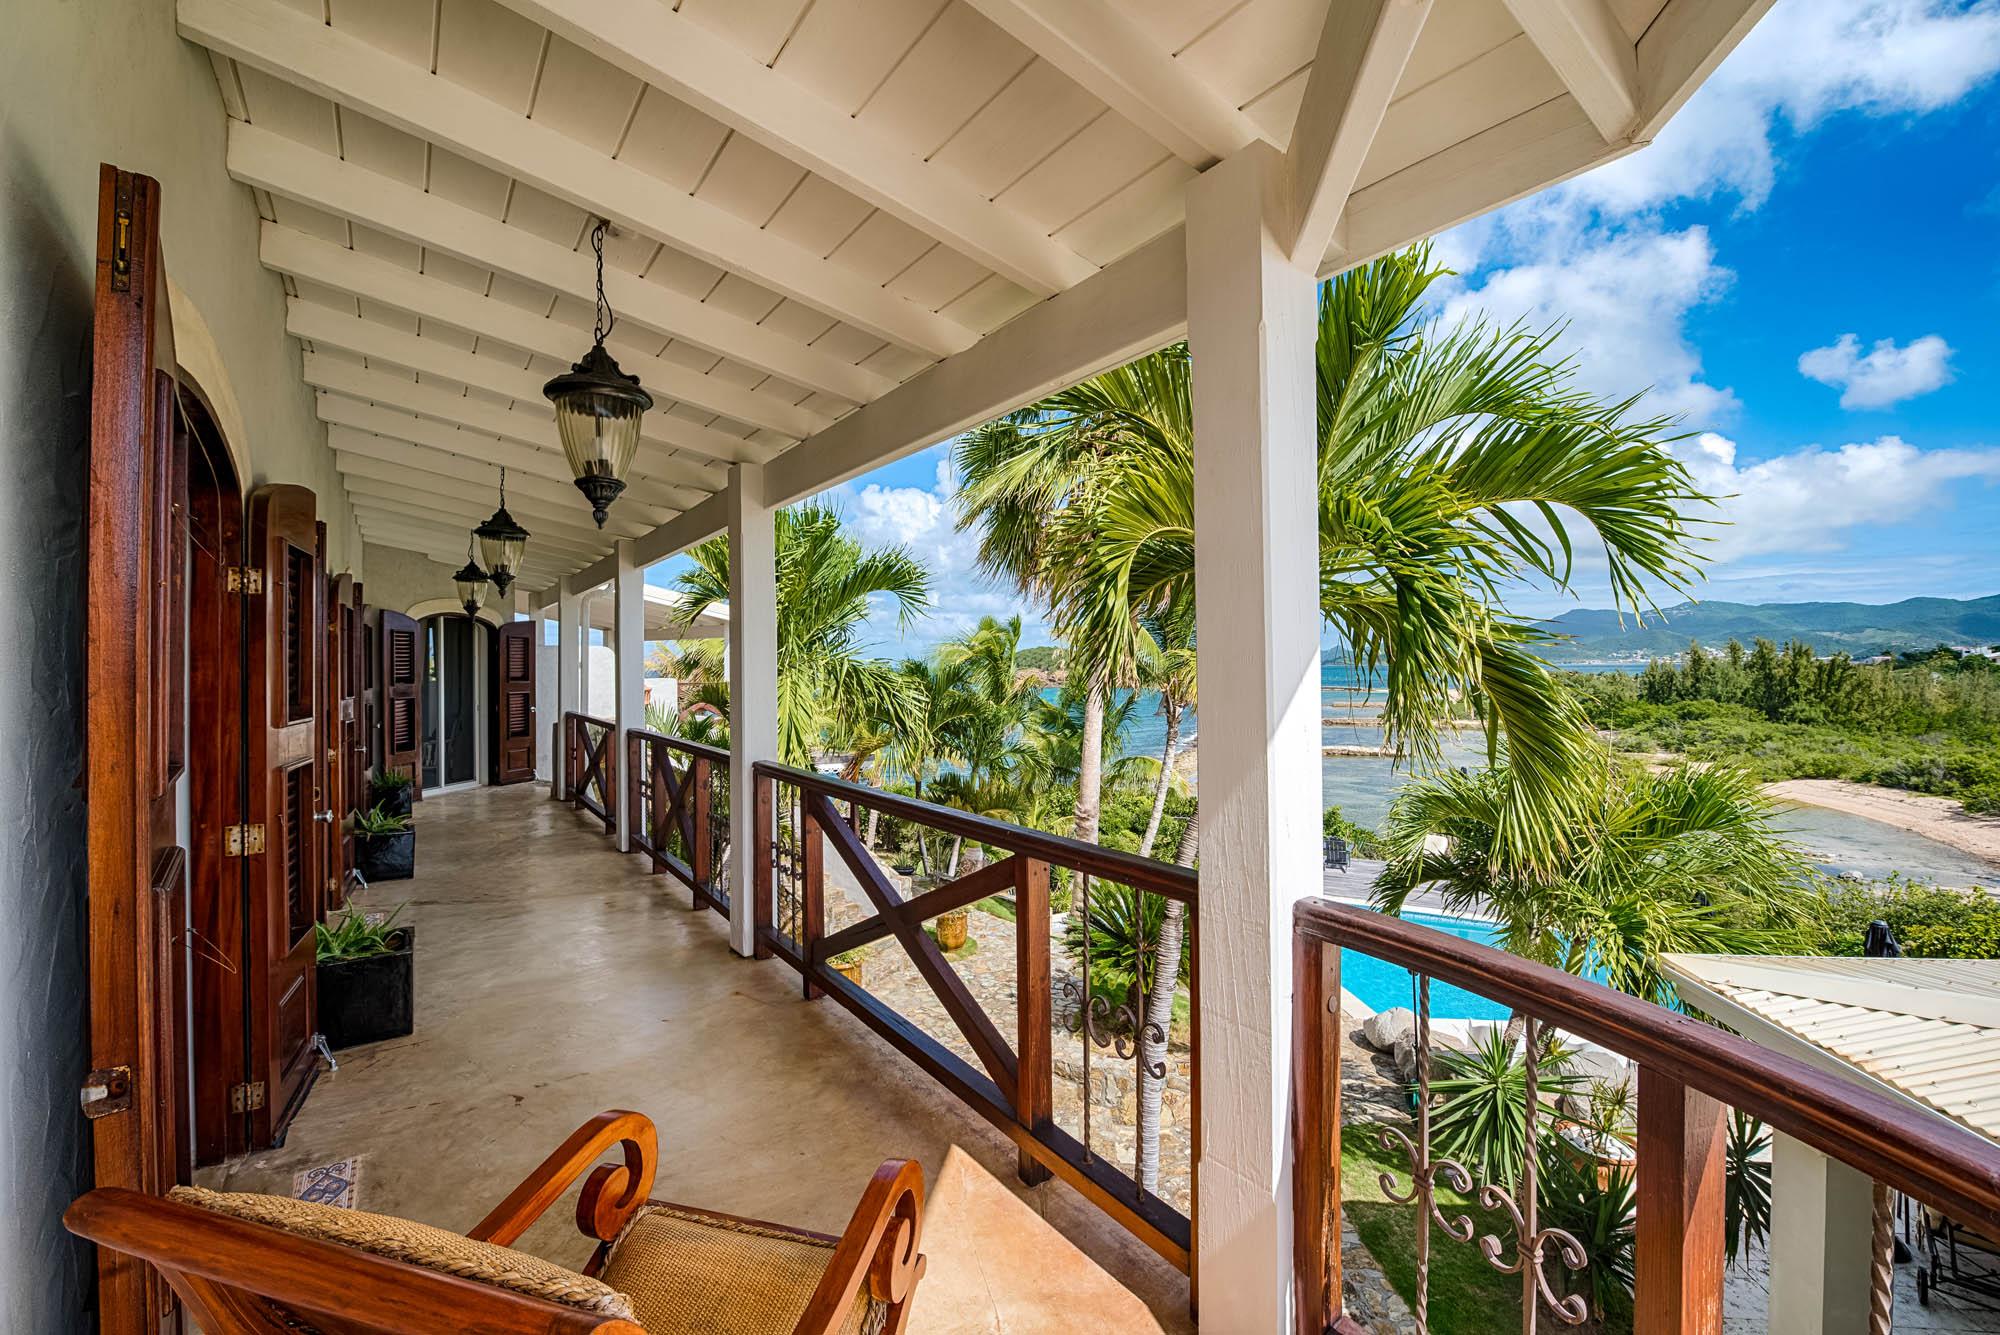 Fantastic views from your private balcony at Le Mas des Sables villa rental, Baie aux Cayes, Terres Basses, Saint Martin, Caribbean.